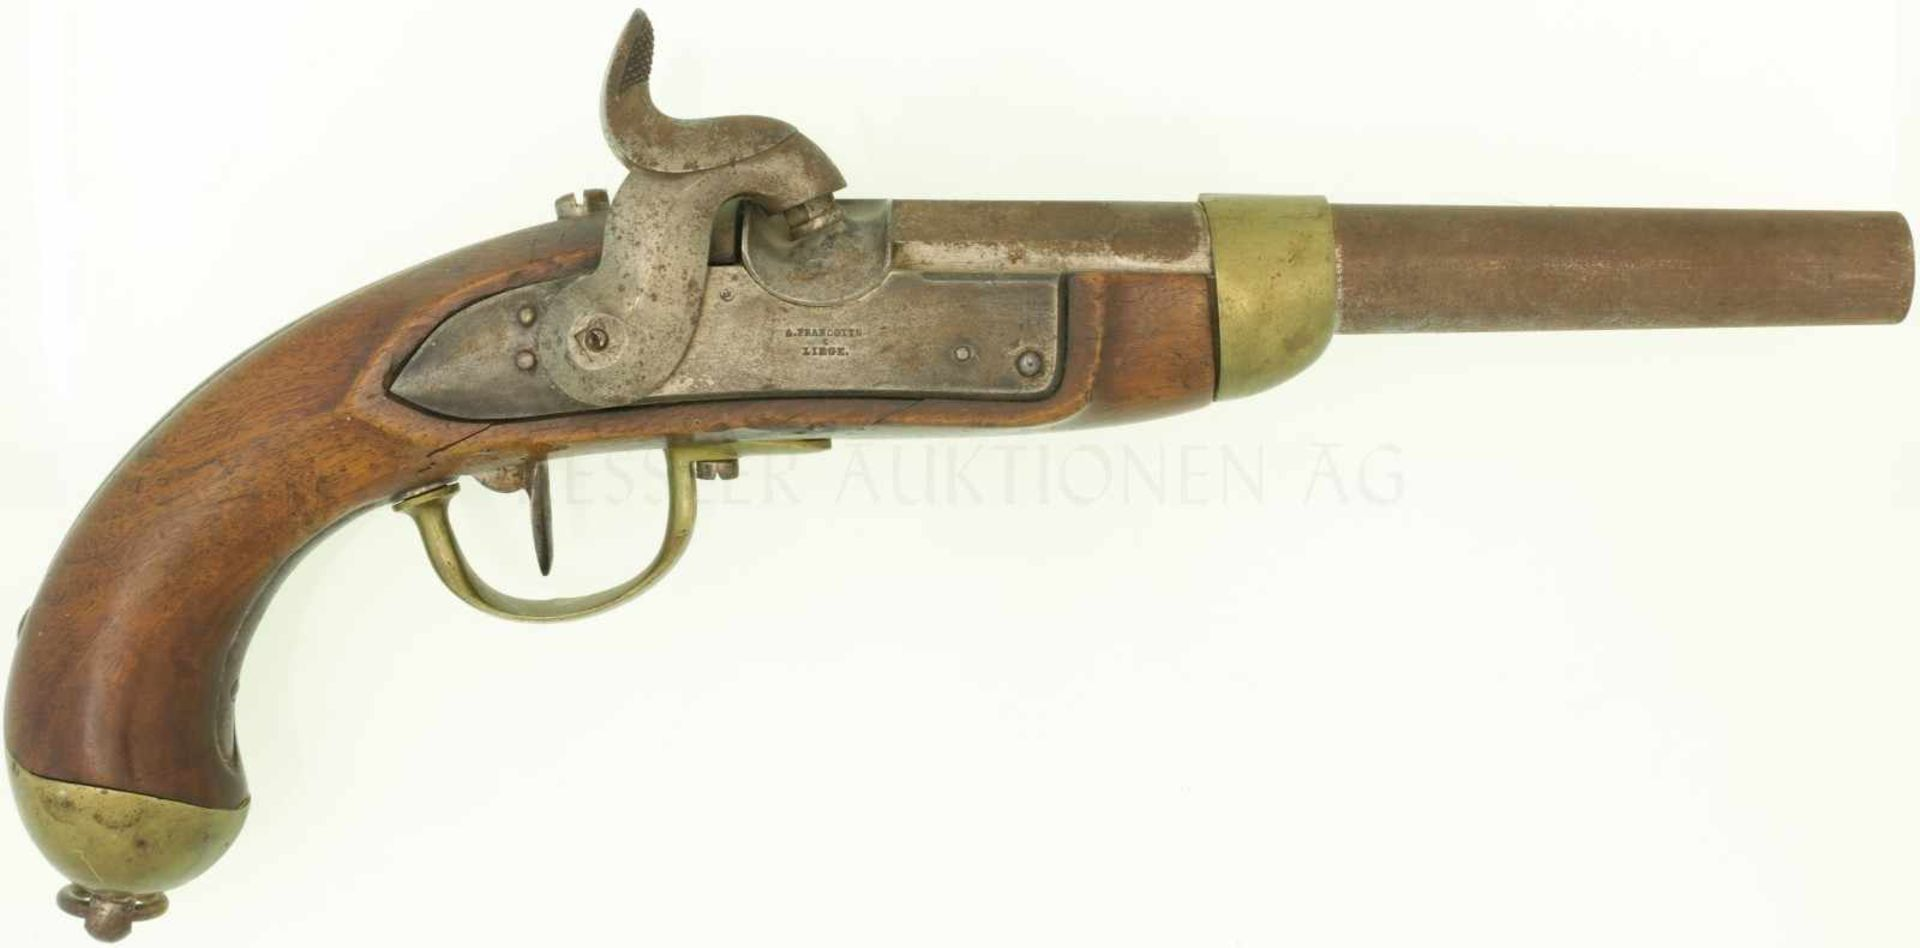 Perkussionspistole, Mod. 1842, Hersteller A. Francotte, Liege. Kal. 17.6mm